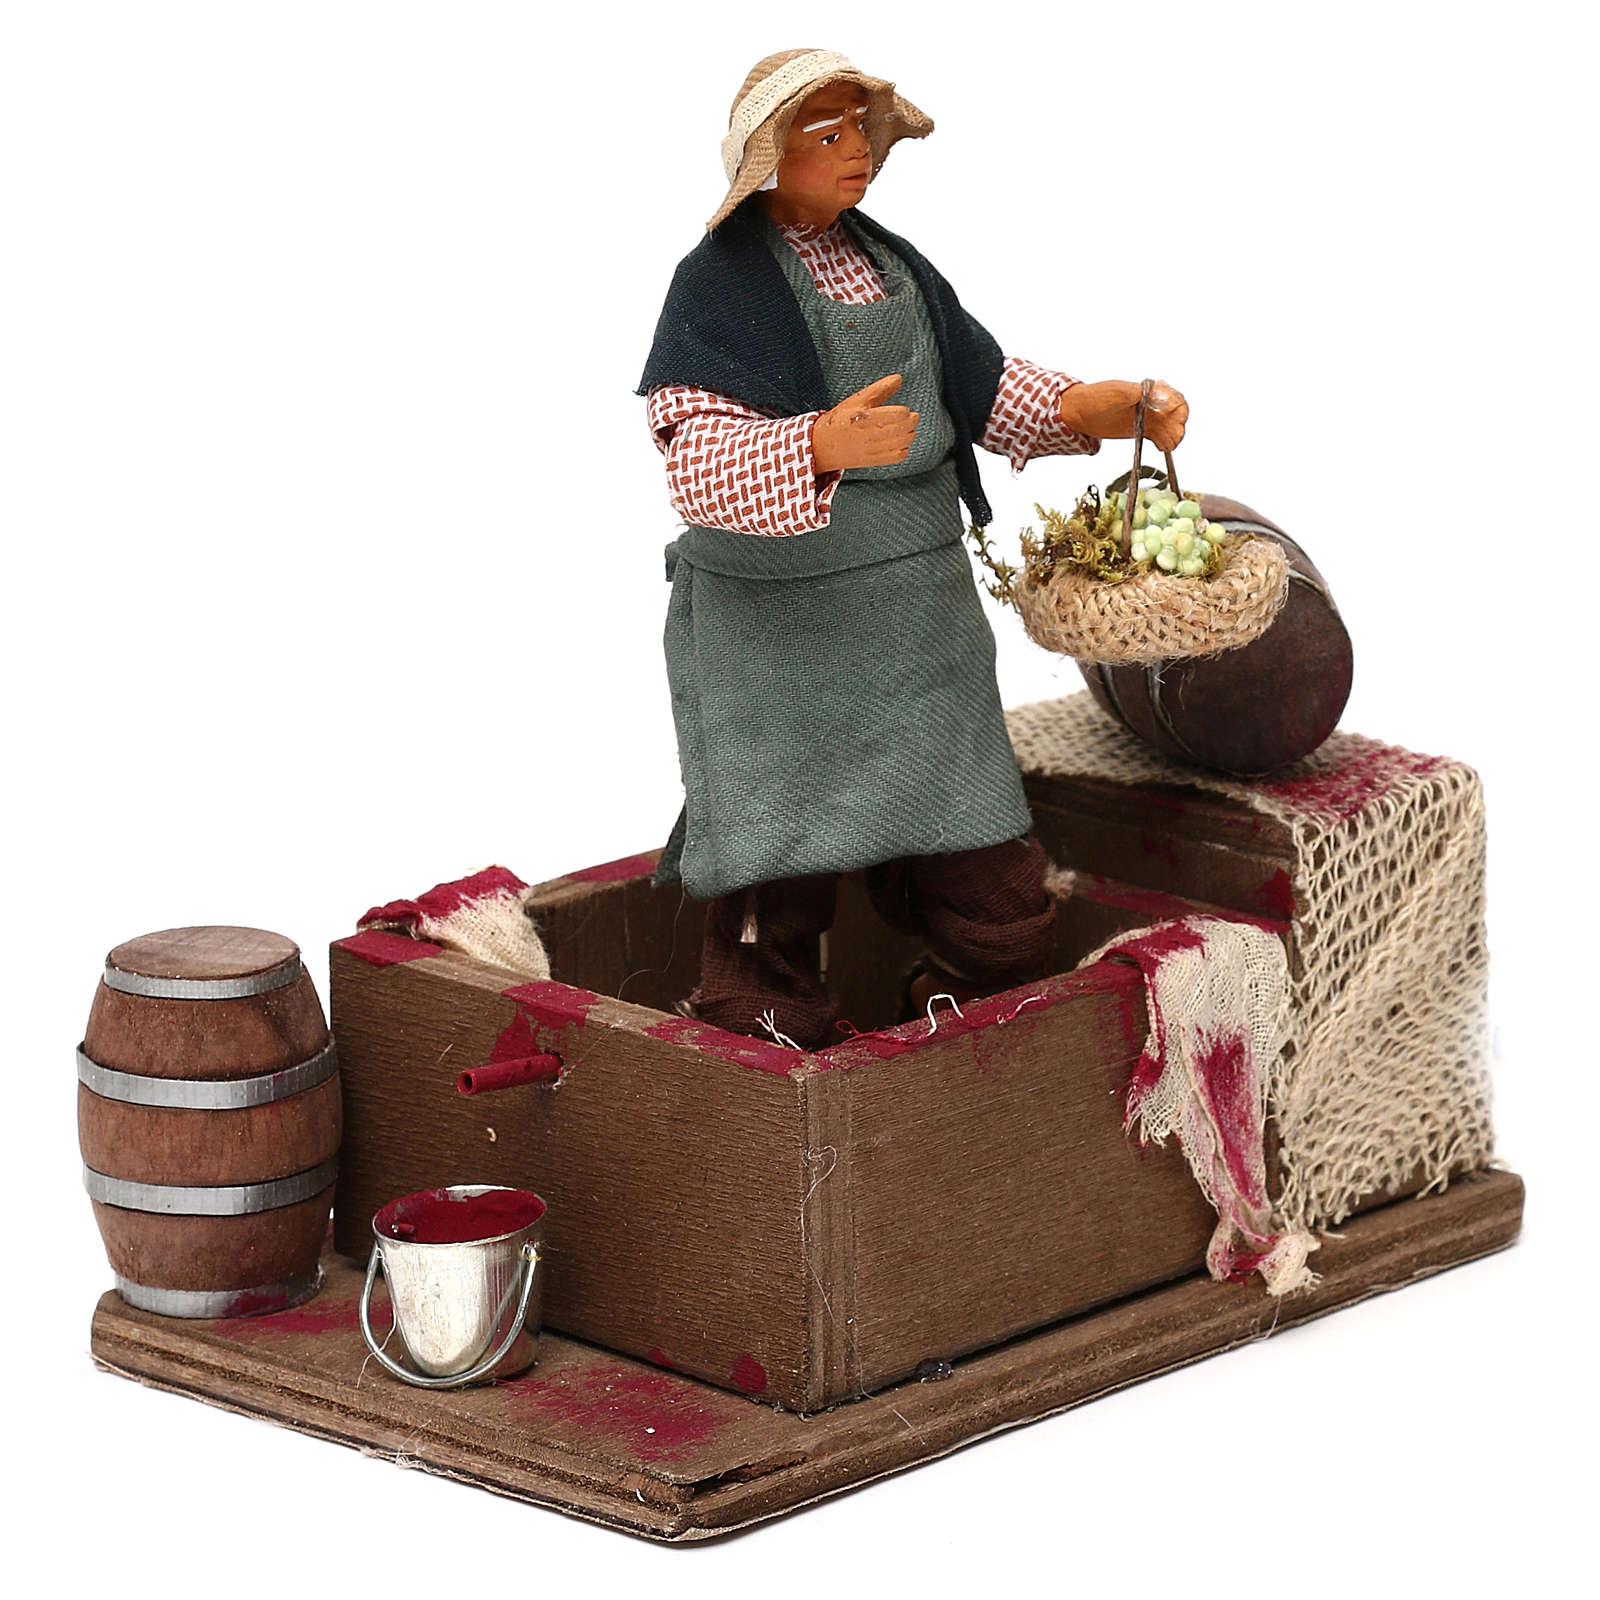 Man squeezing Grapes 12cm neapolitan animated Nativity 4